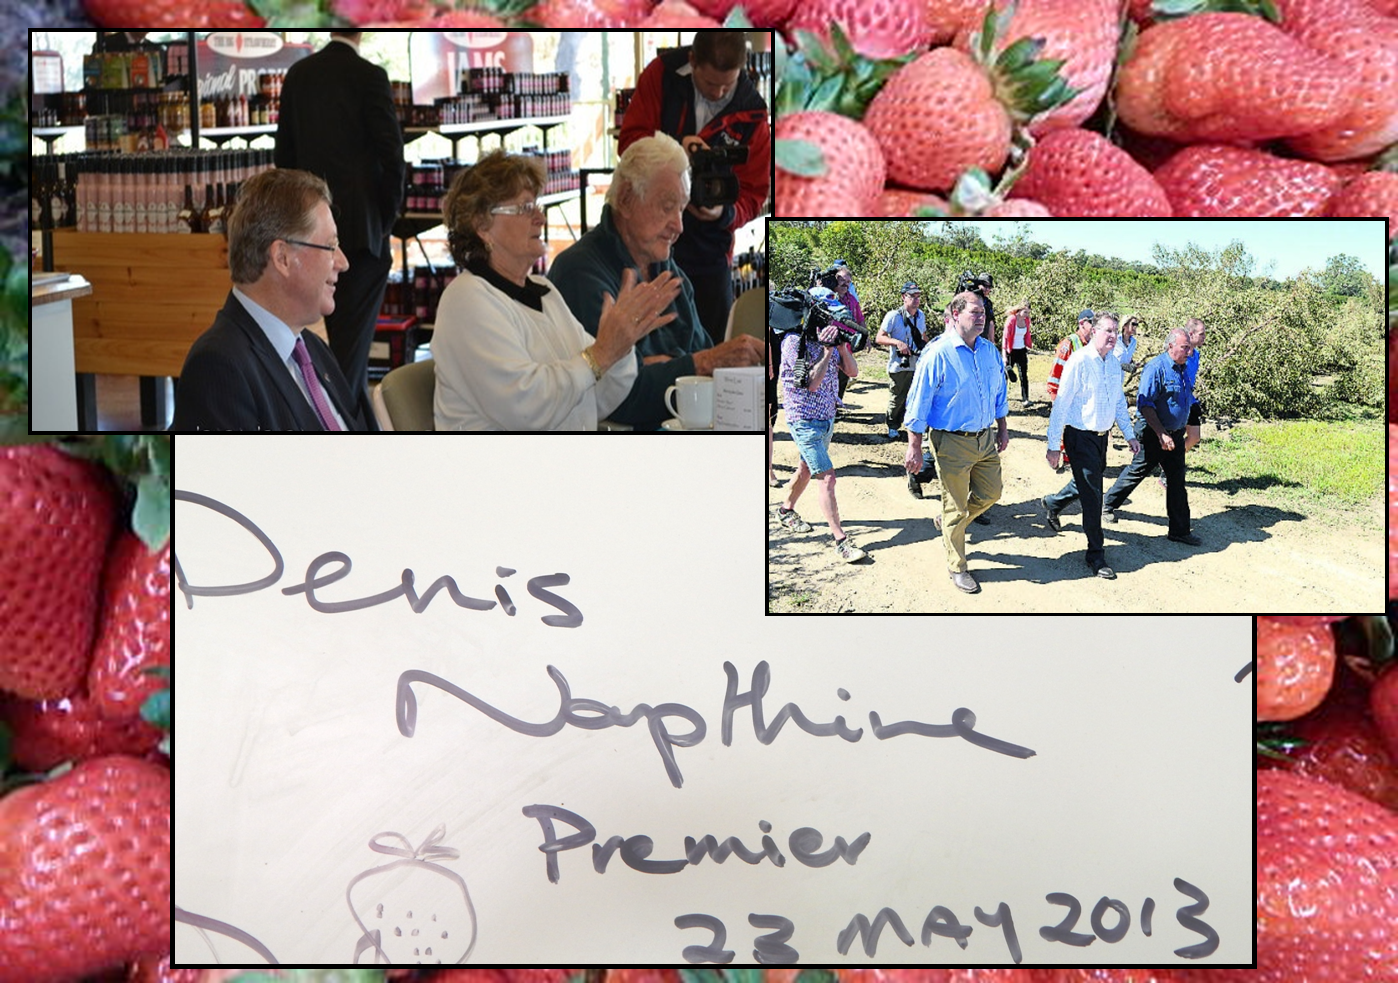 former Victorian Premier Dr Dennis Napthine